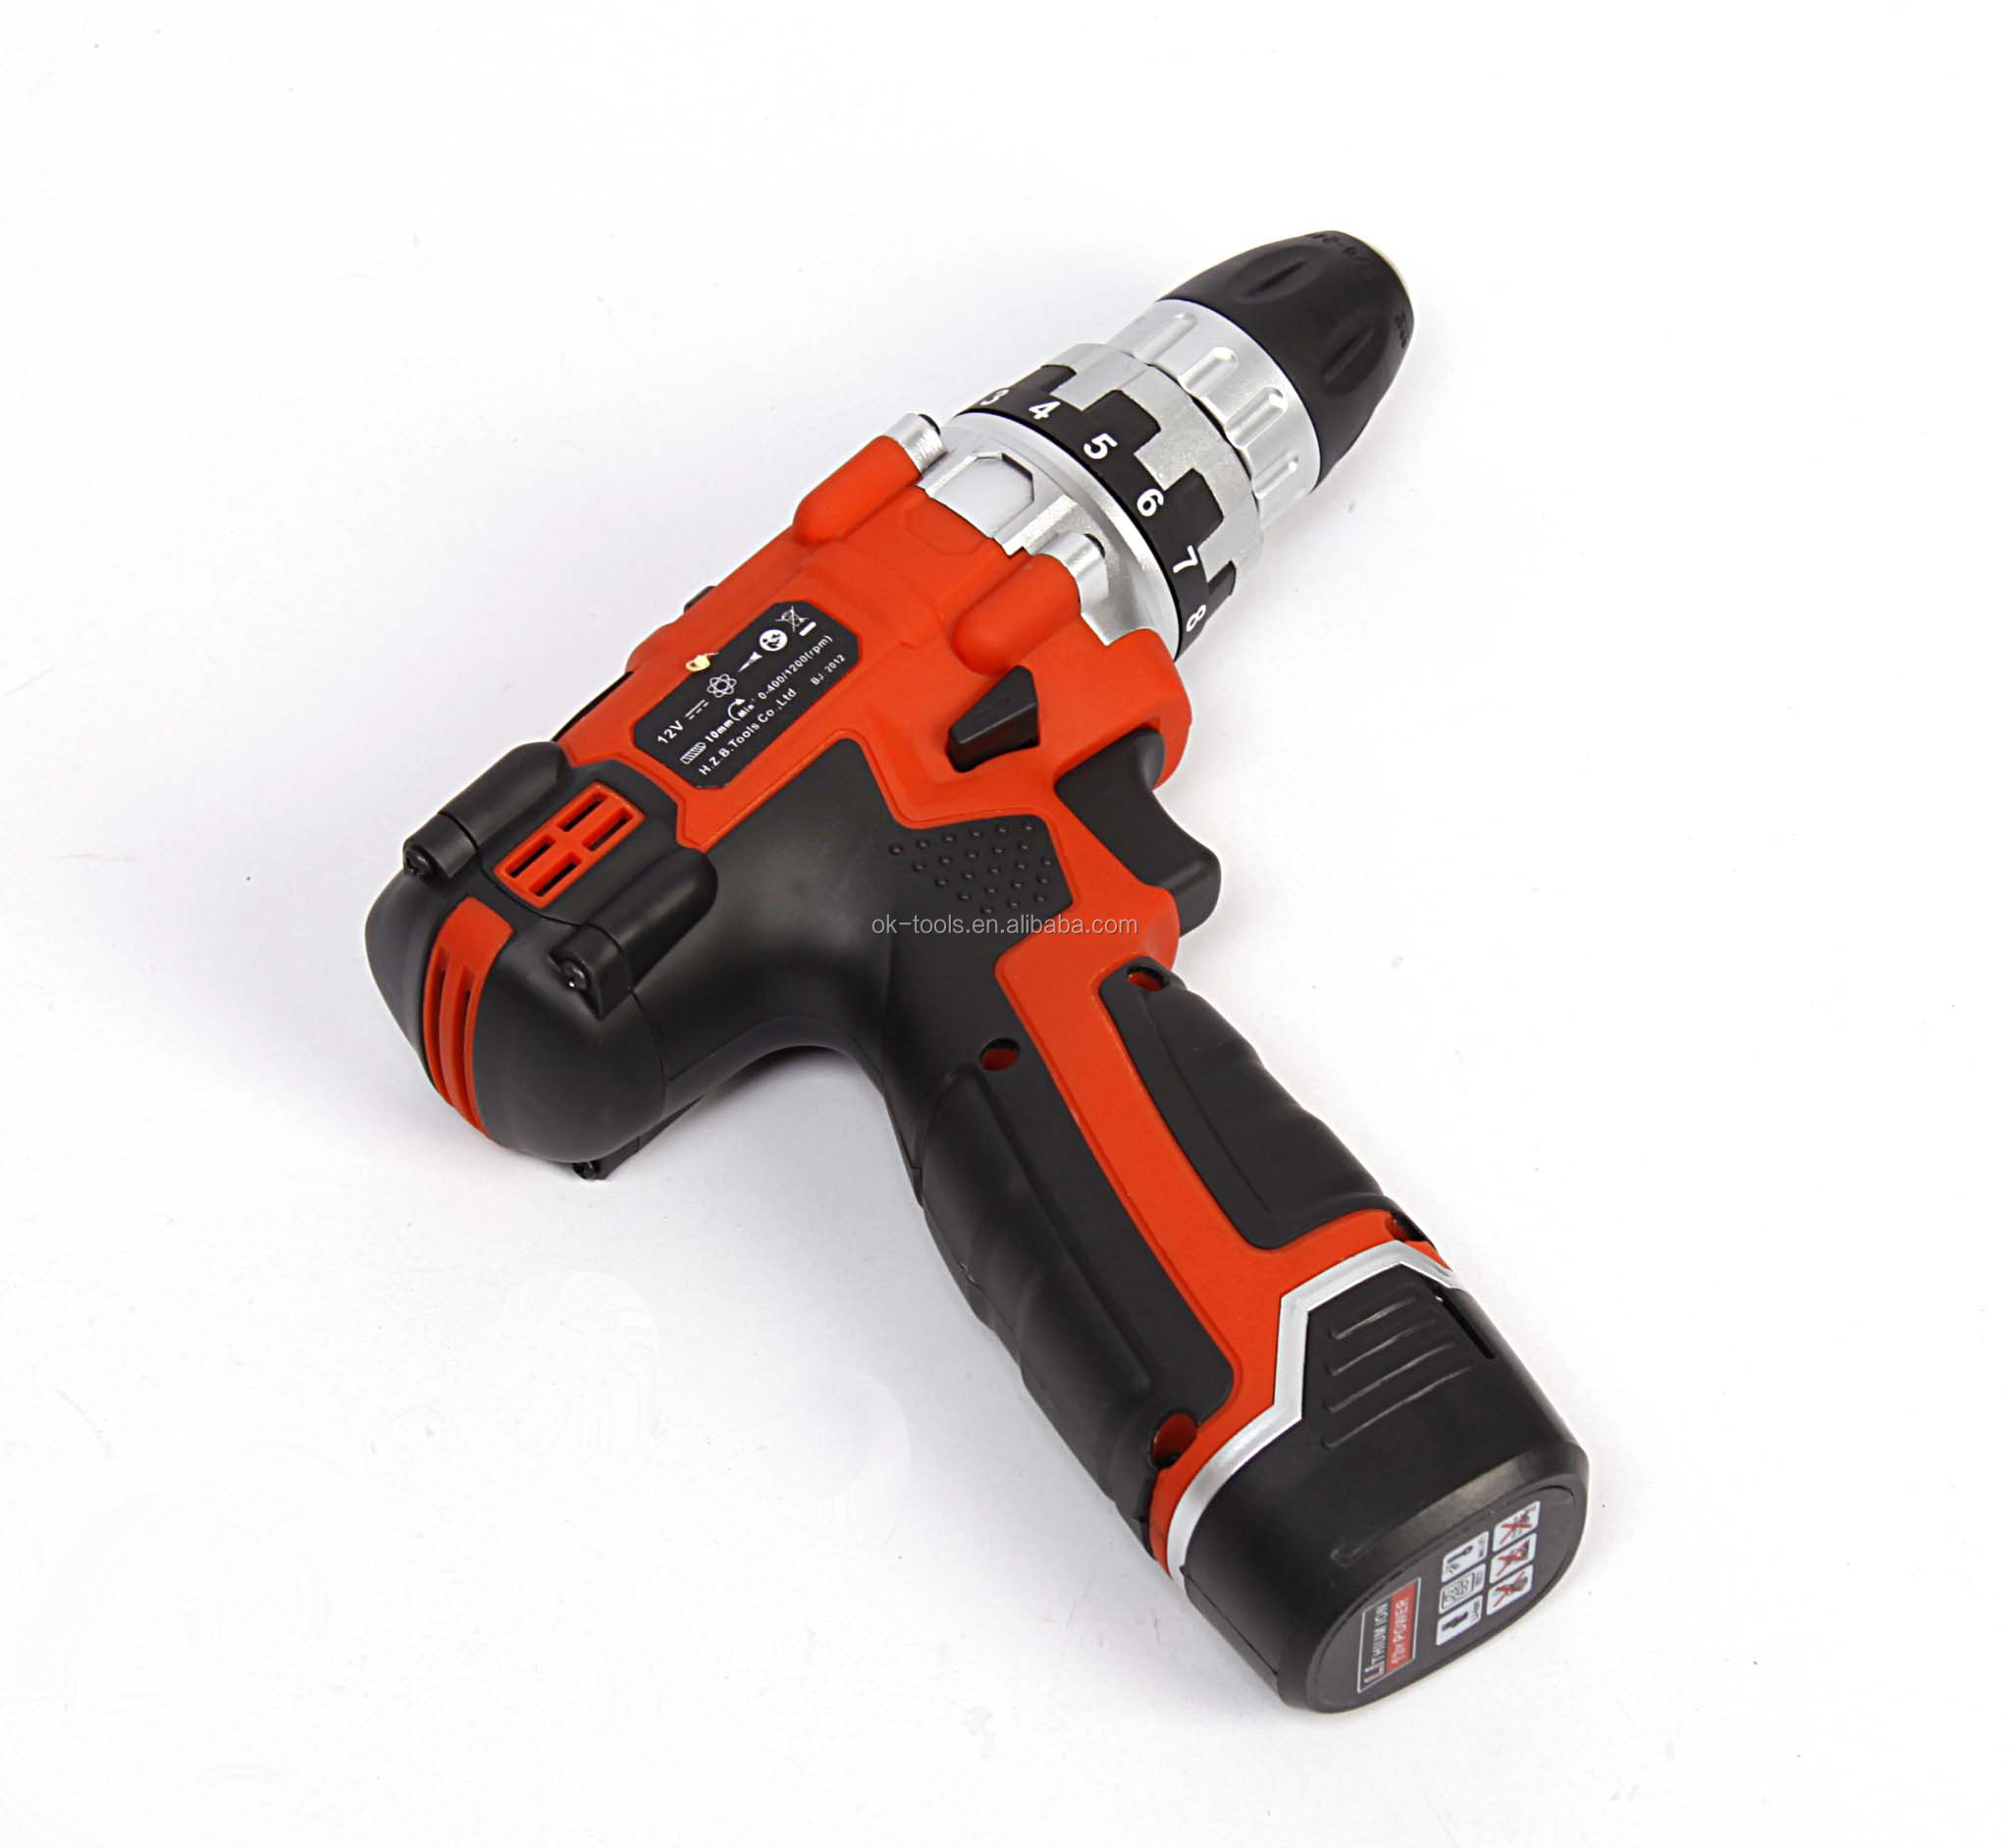 New 2014 Ok Tools 12v Li-ion Battery Cordless Drill Of Power Tool ...